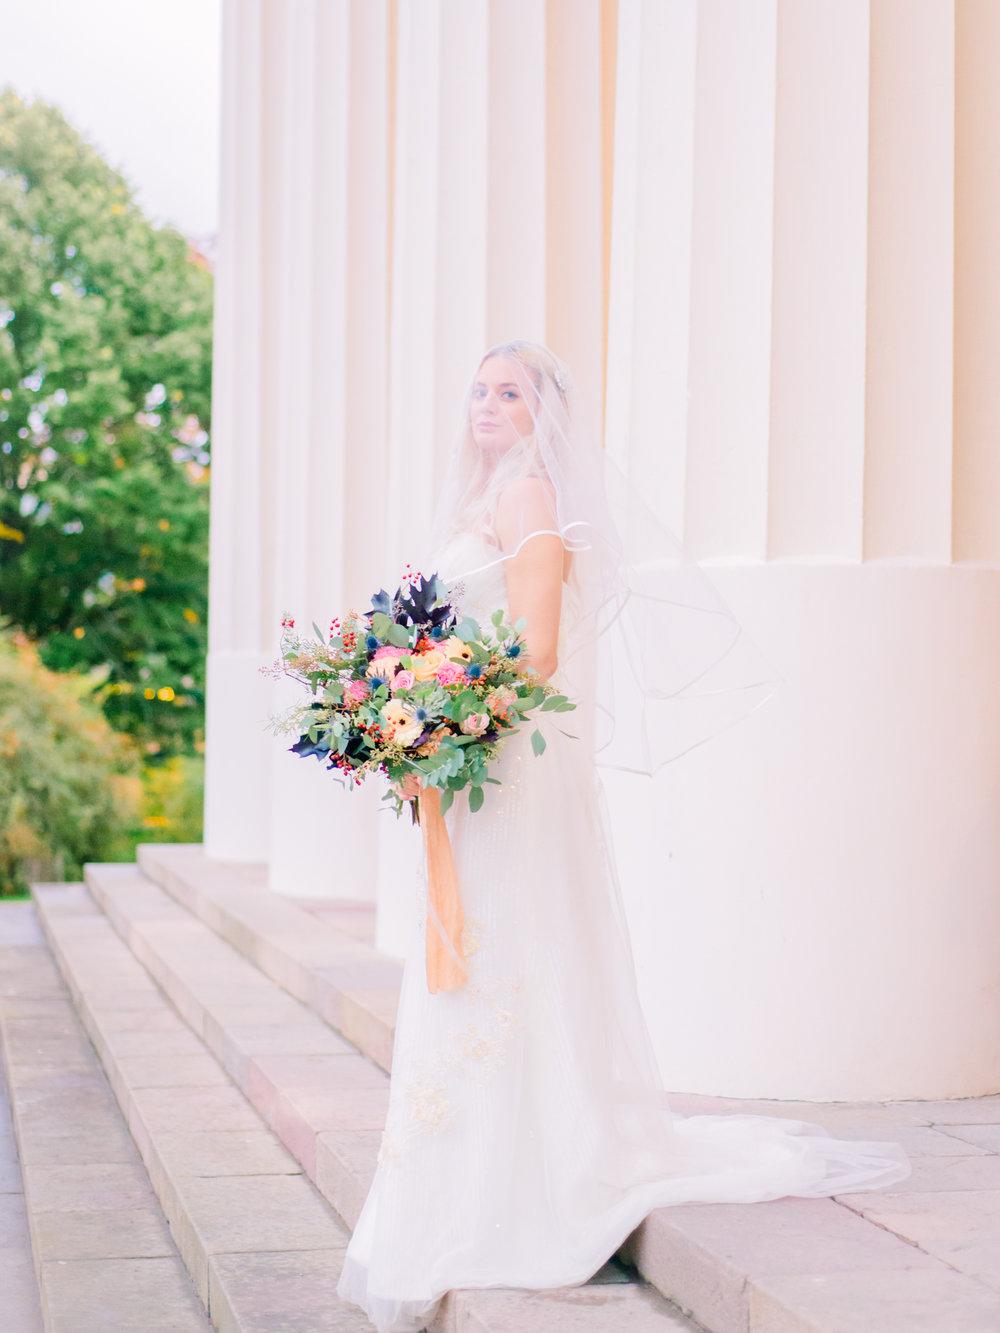 Elegant Organic Fall Swedish Bridal Wedding Styled Shoot - Erika Alvarenga Photography-67.jpg